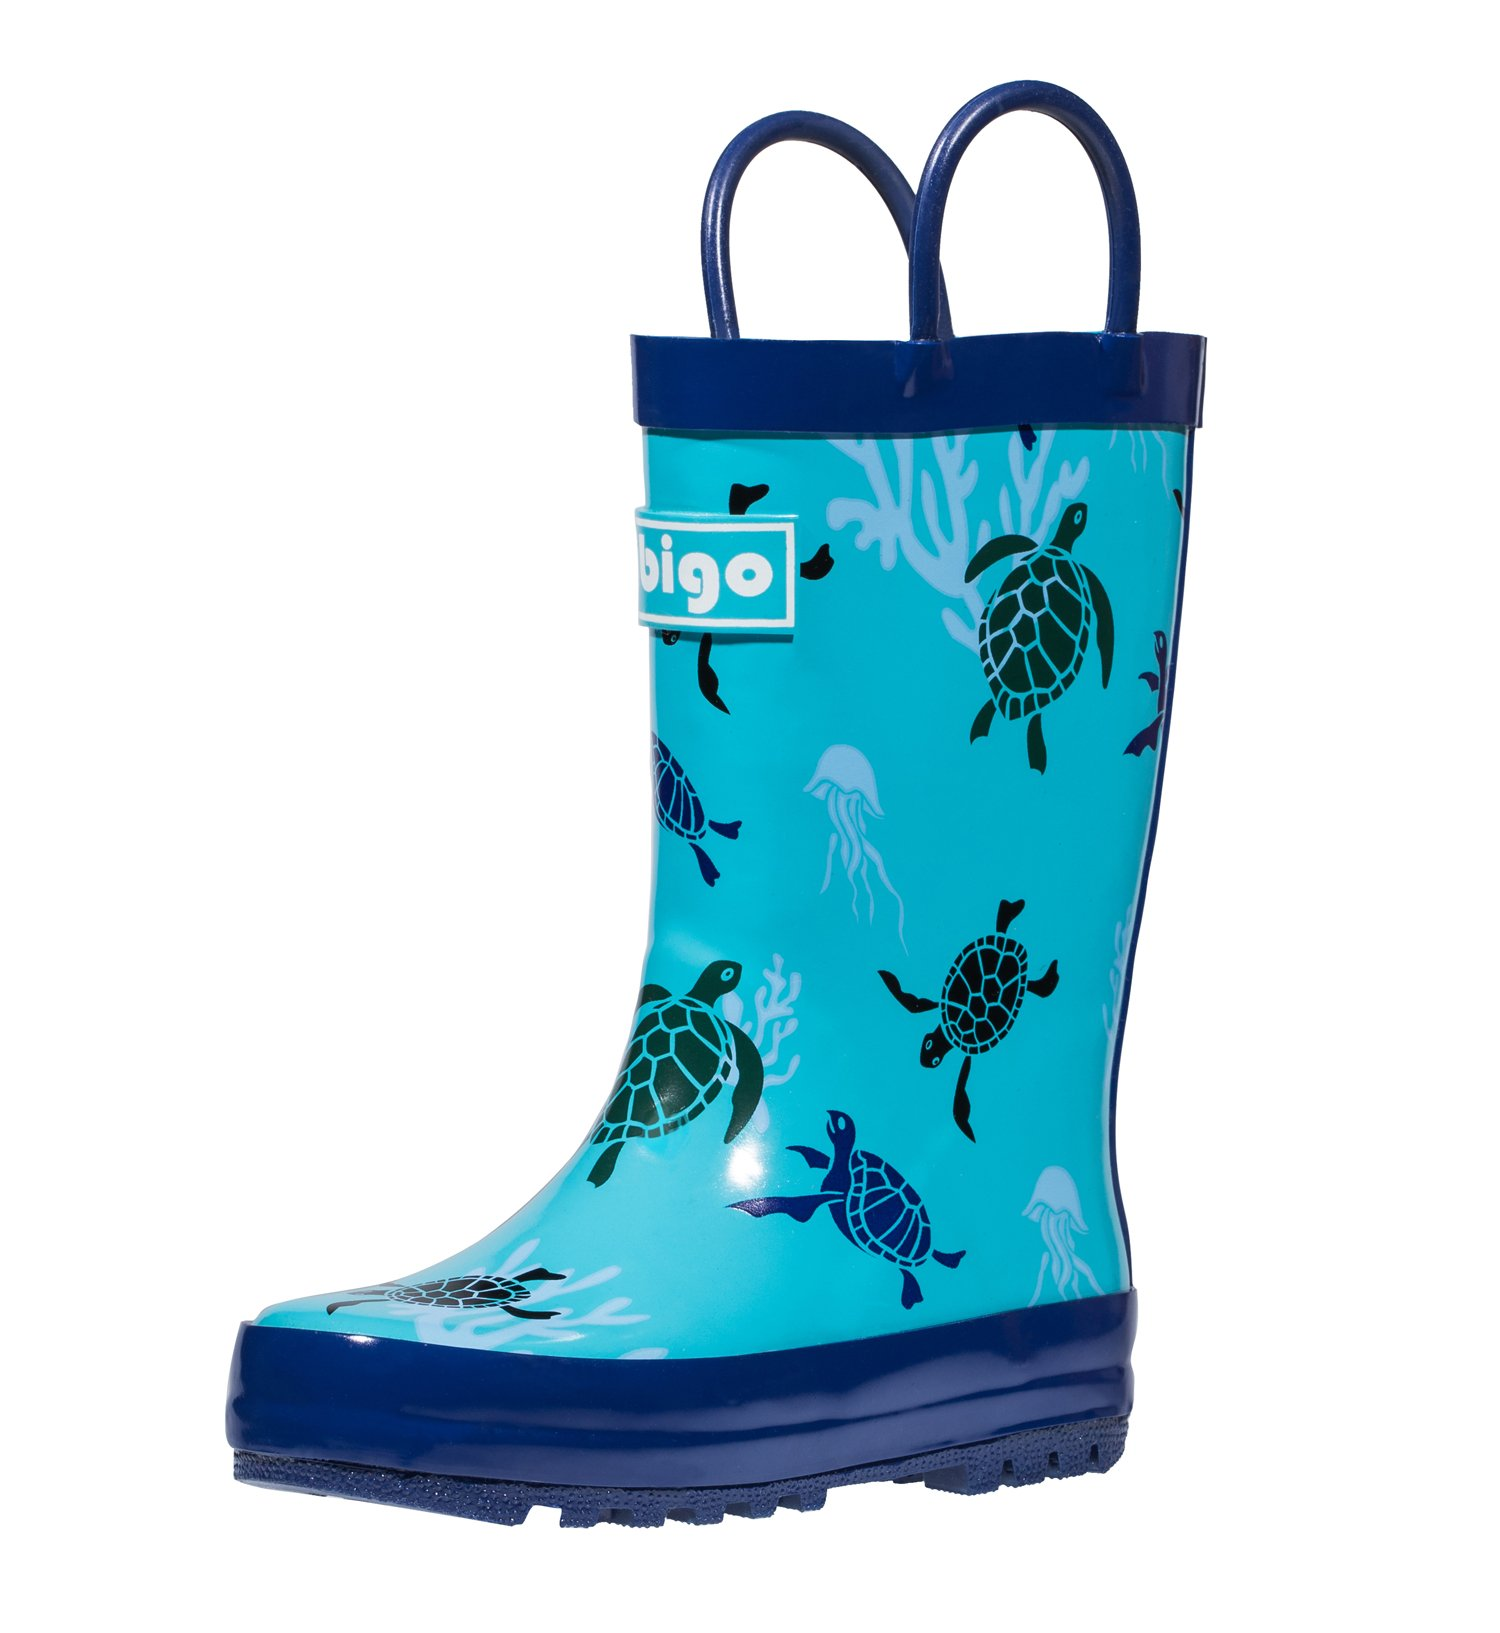 hibigo Children\'s Natural Rubber Rain Boots with Handles Easy for Little Kids & Toddler Boys Girls, Turtle